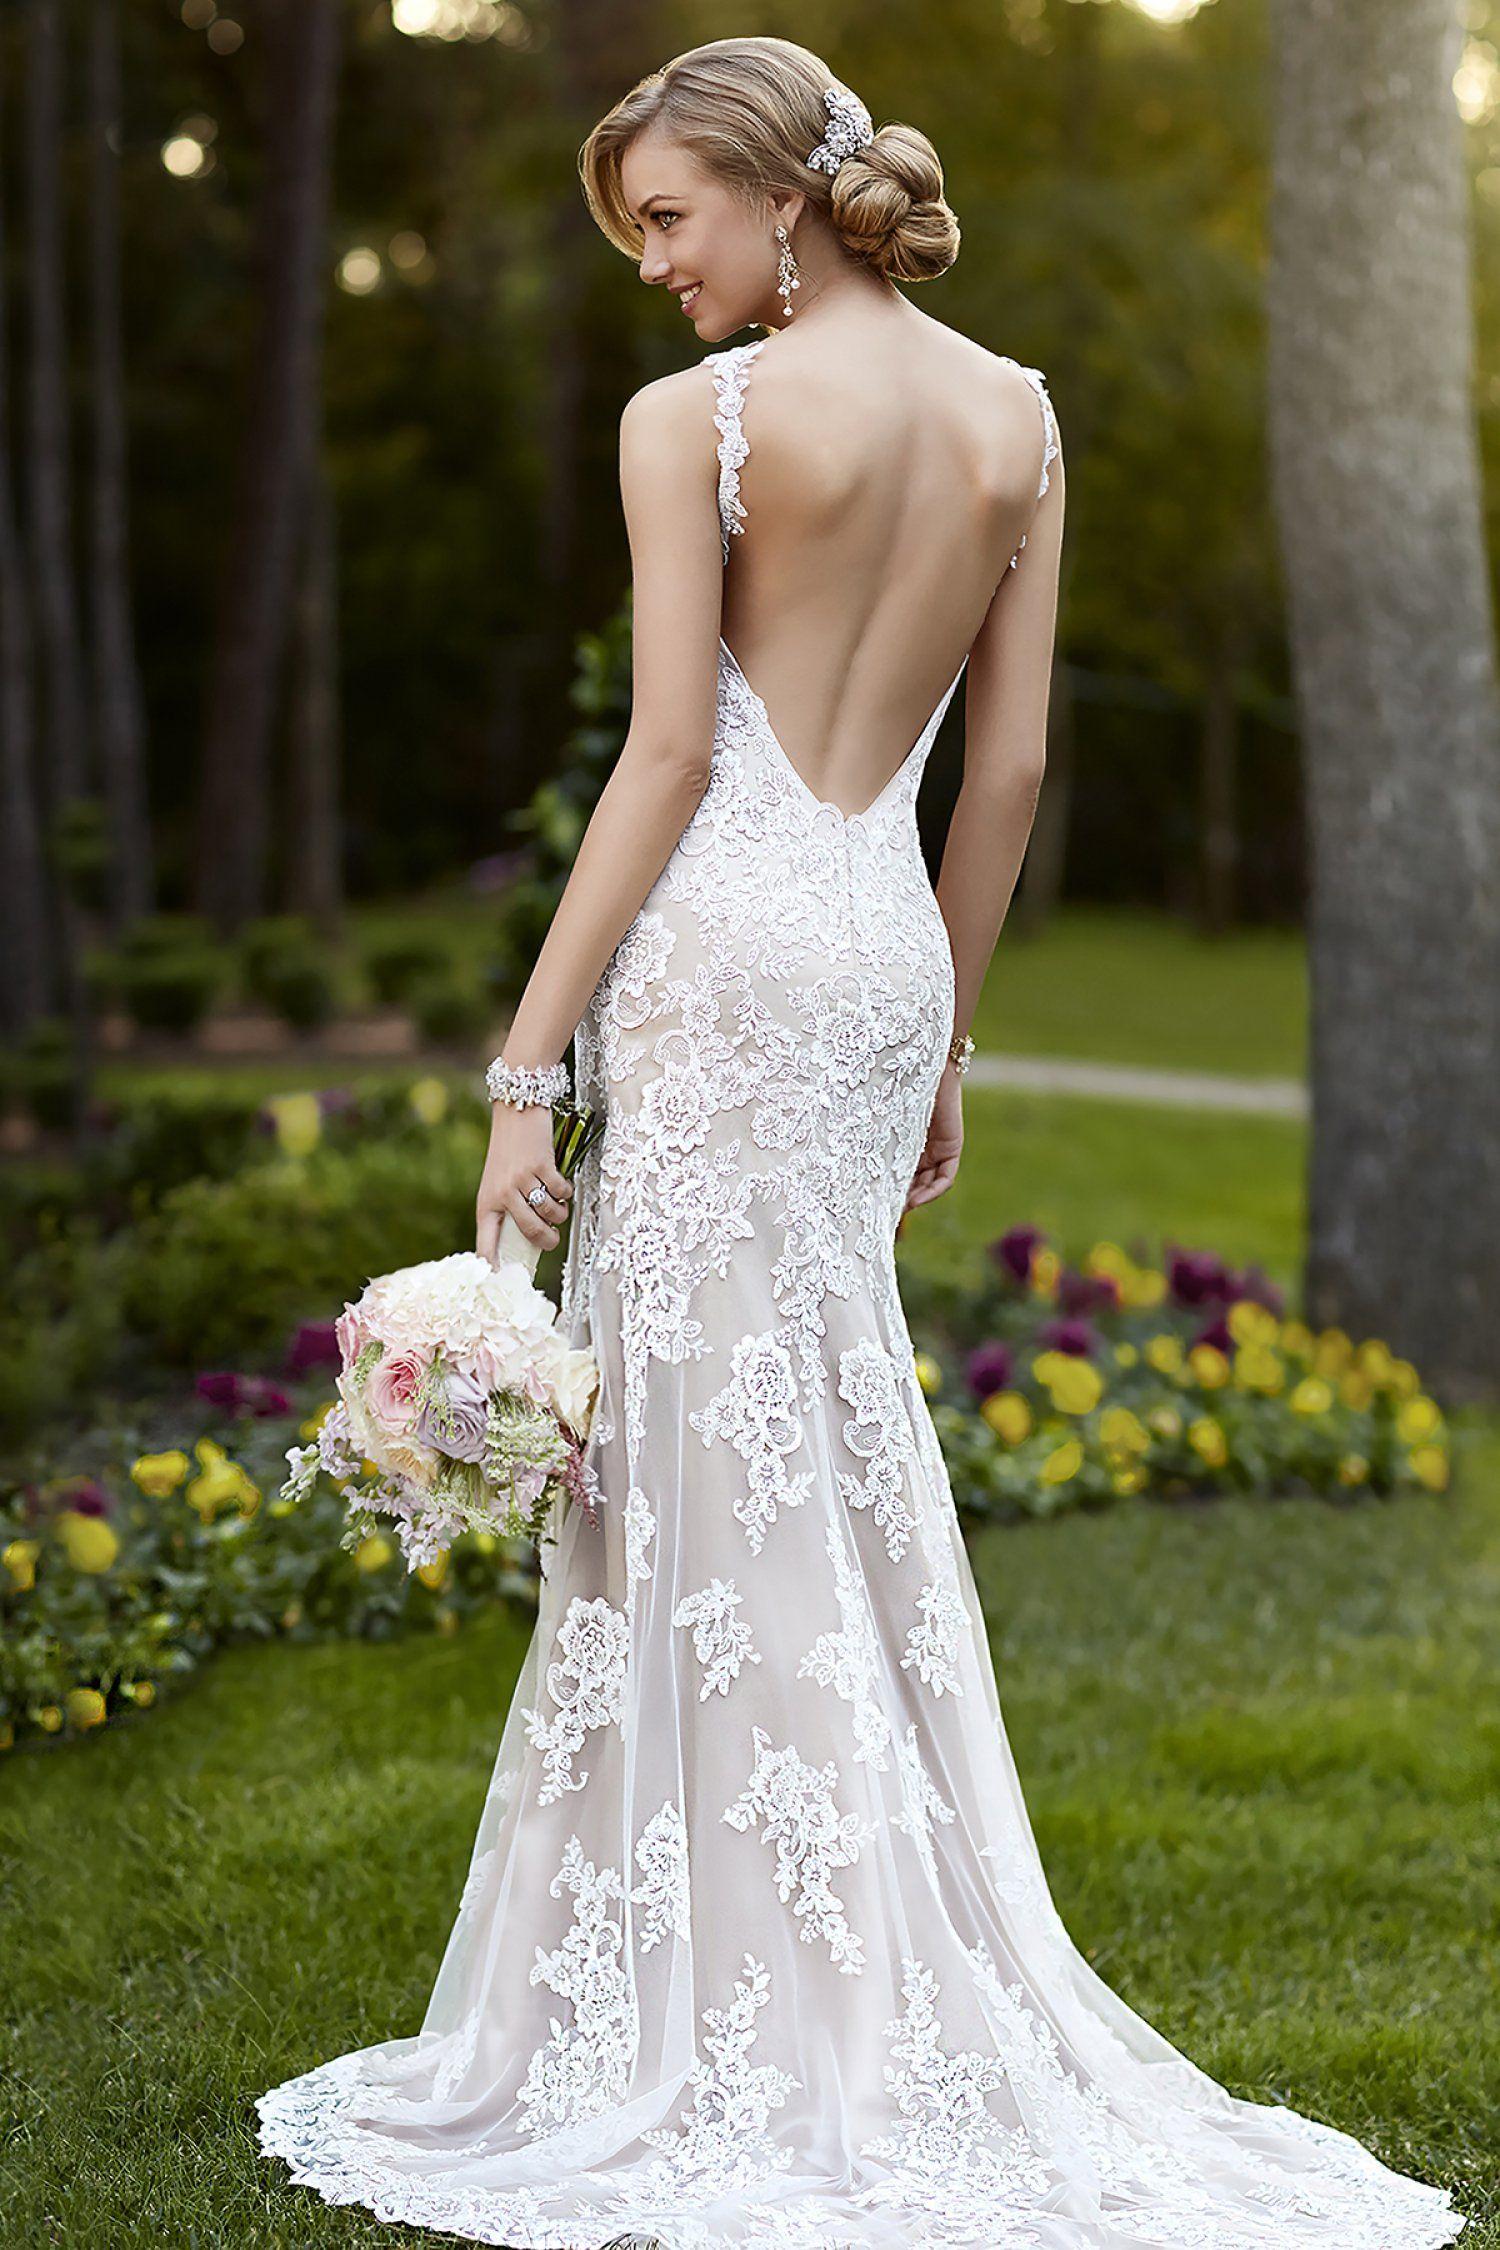 Stella York 5984 Back View Debra S Bridal At The Avenues 9365 Philips Hwy Jacksonville Fl 32256 904 519 9900